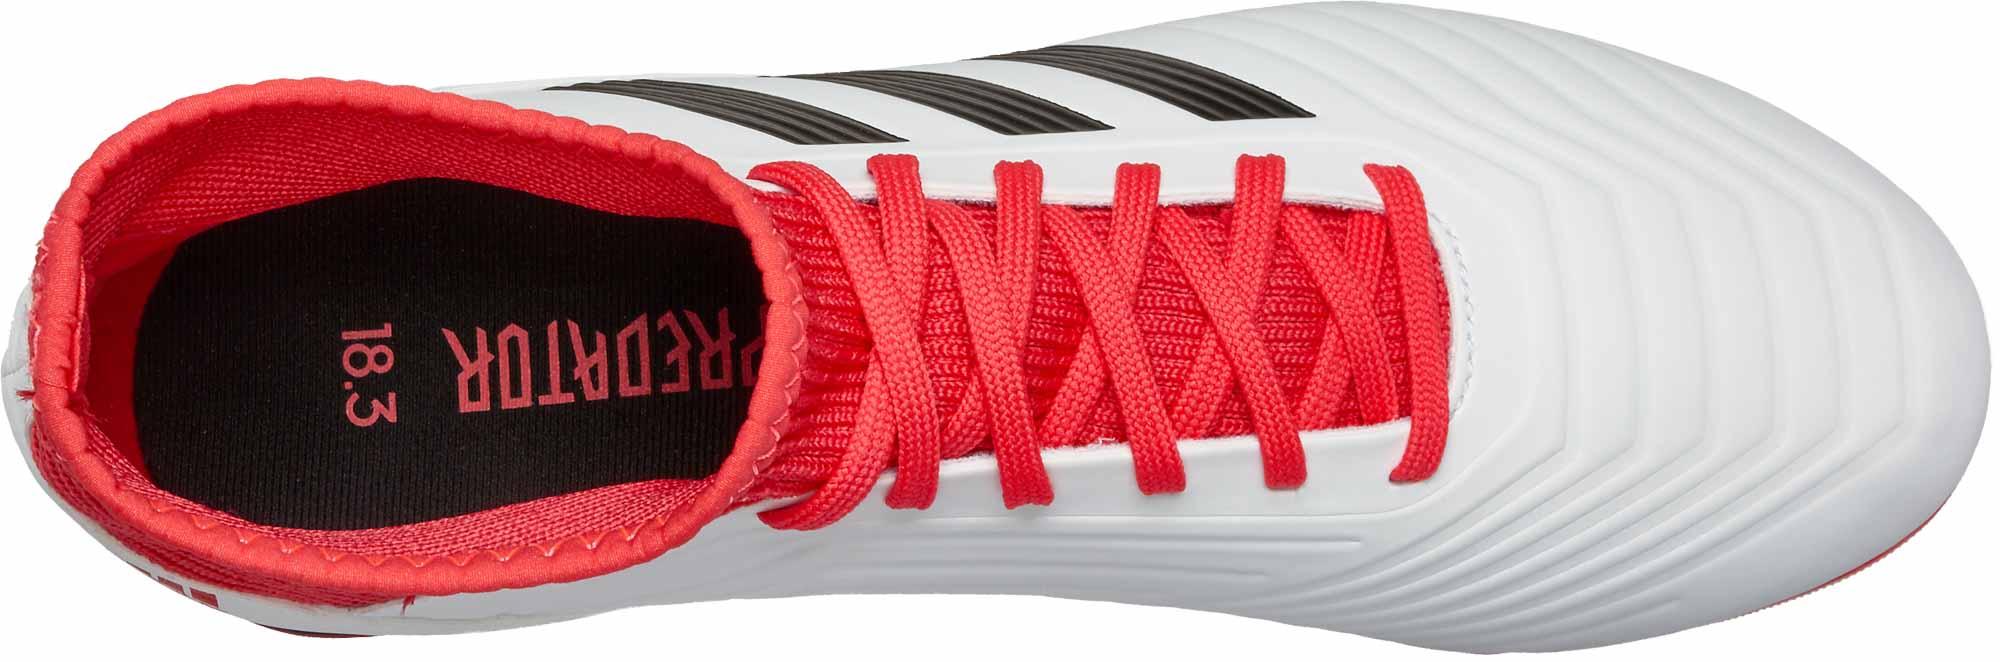 Adidas Predator 18,3 Juventud